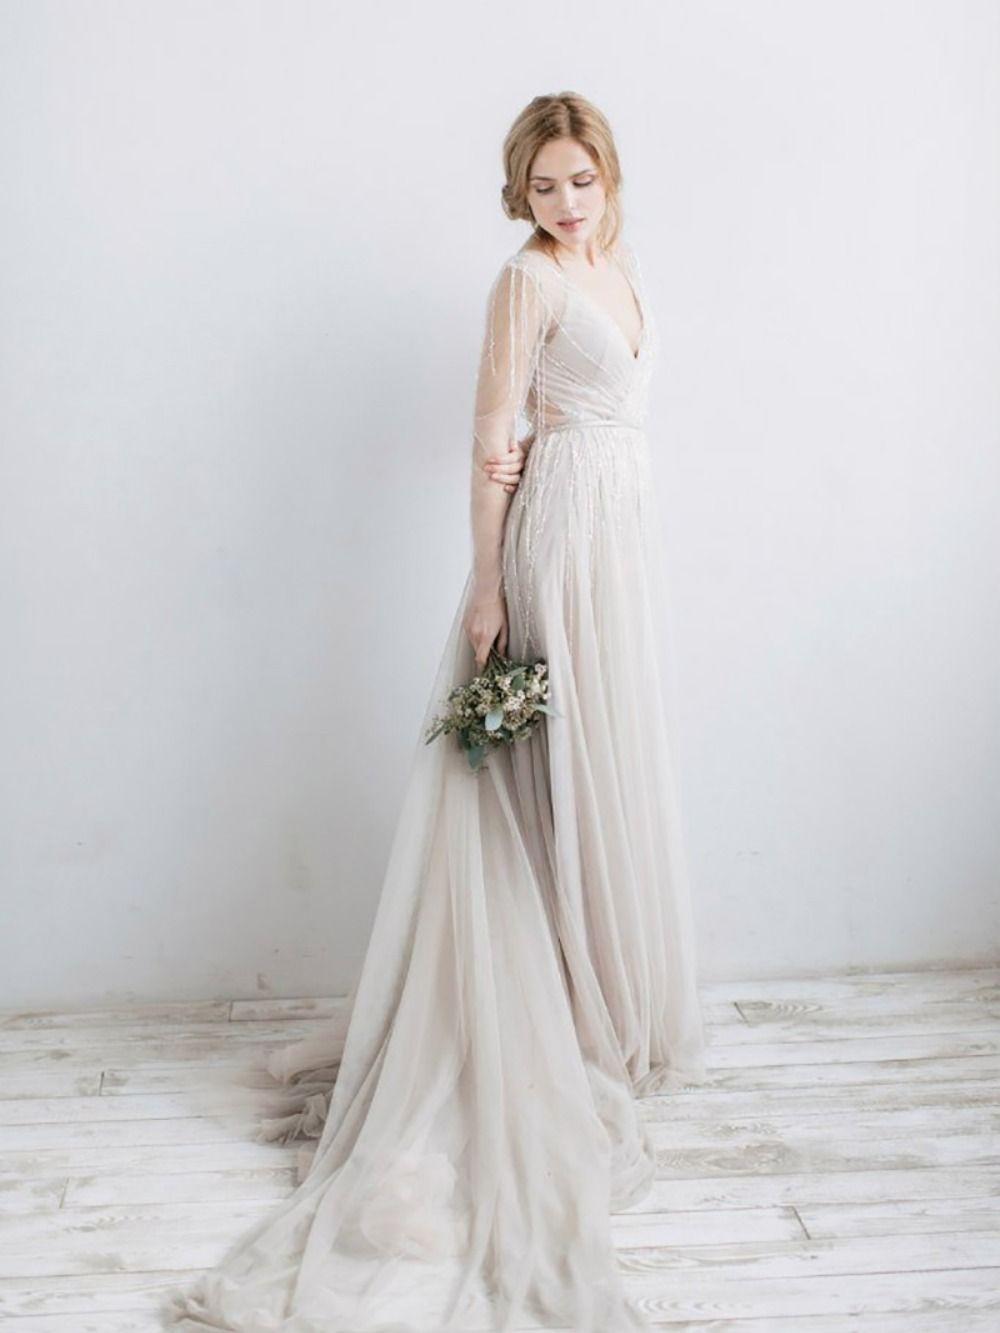 12 Dreamy Wedding Dresses On Etsy | Hochzeitskleider, Brautkleider ...